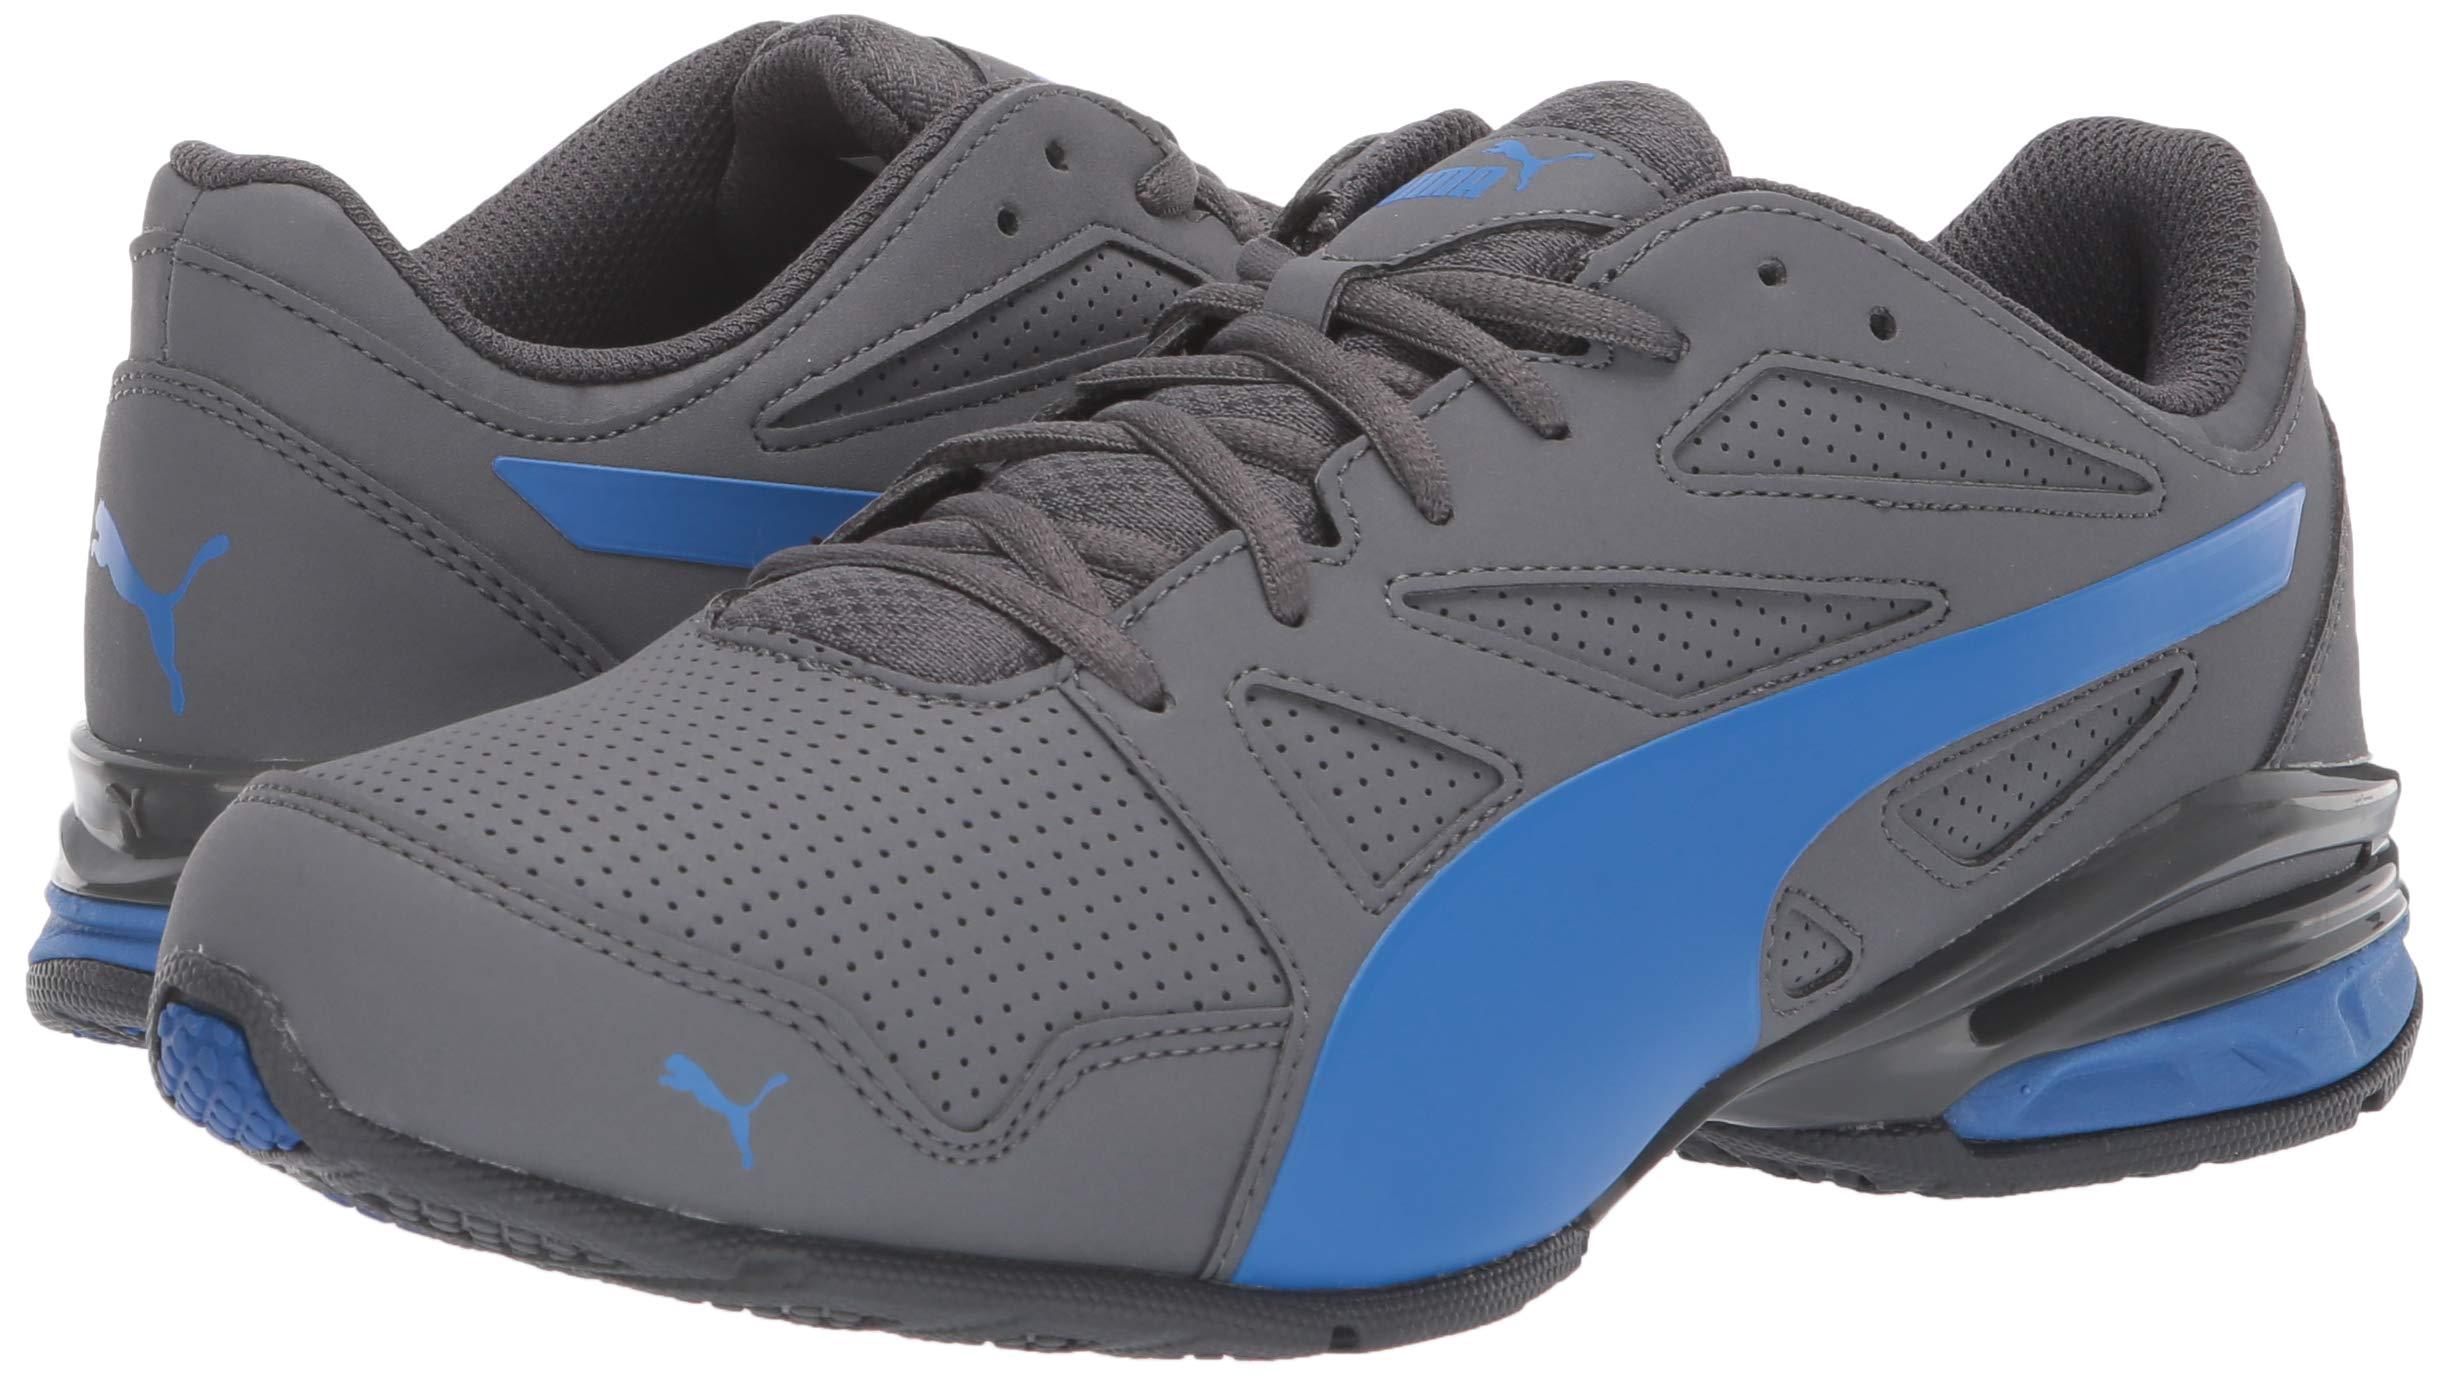 737b0ced41a PUMA Men s Tazon Modern SL FM Sneaker - TAZON MODERN SL FM-M   Fashion  Sneakers   Clothing